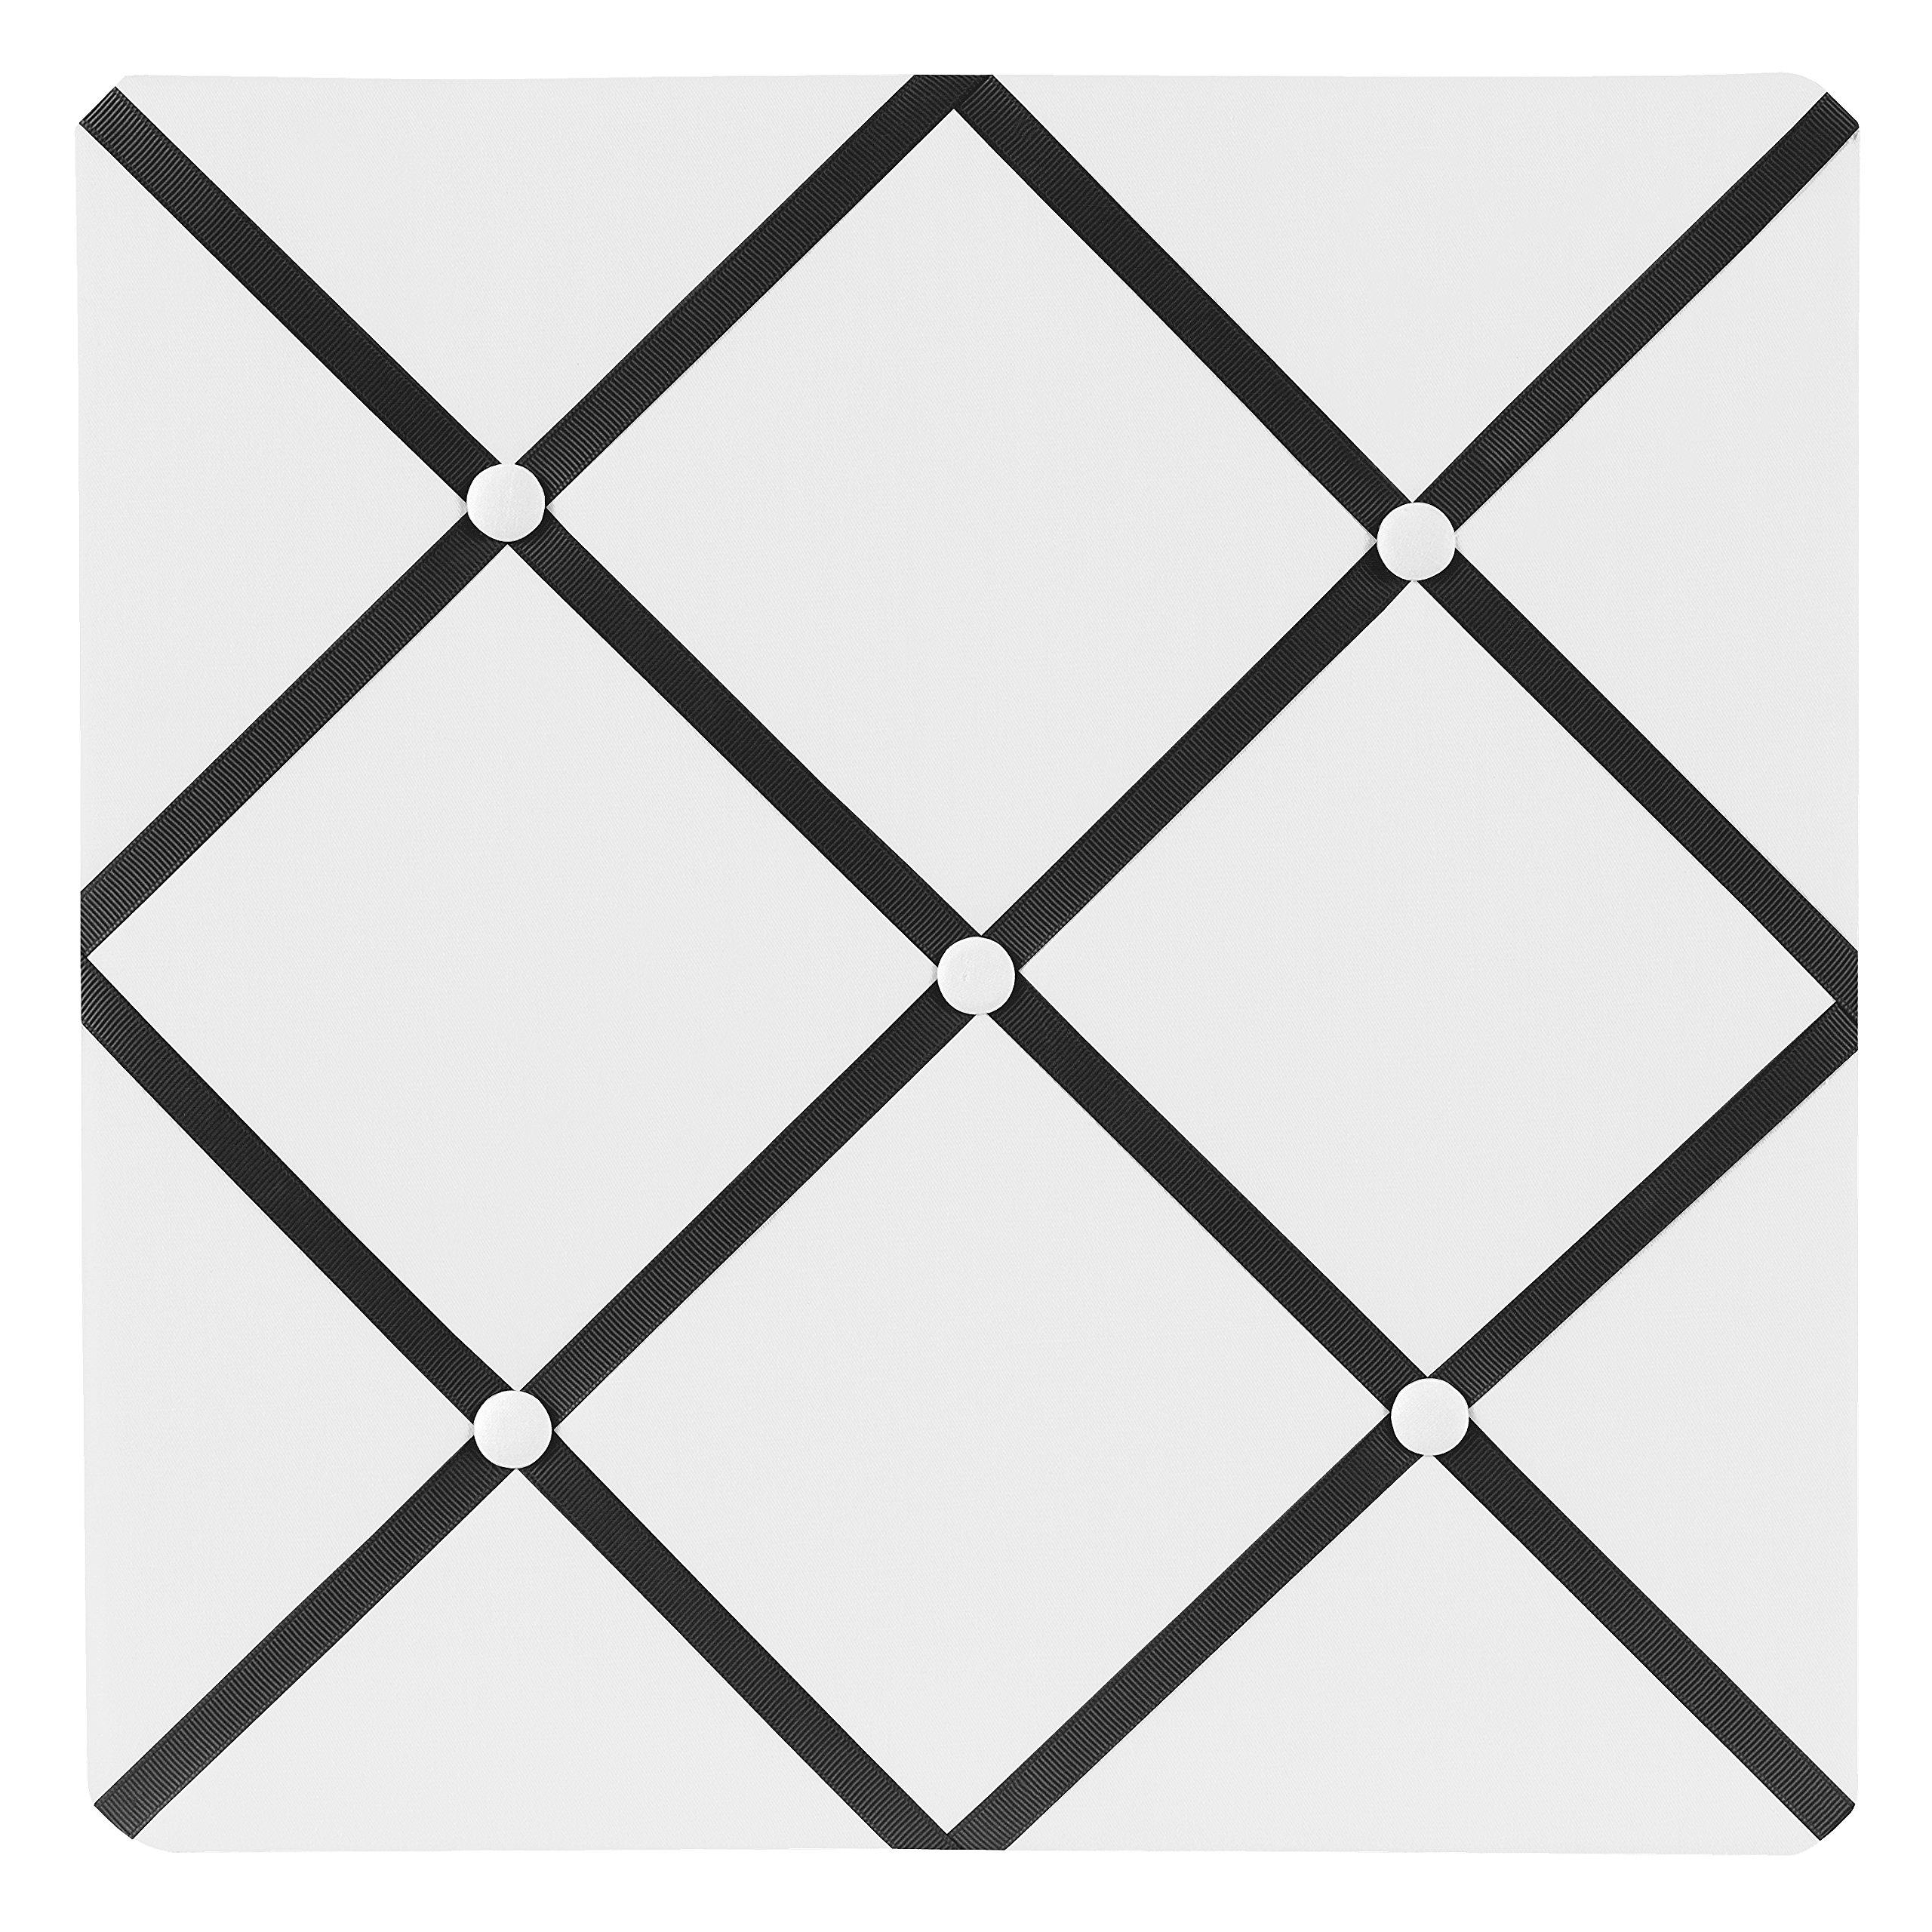 Sweet Jojo Designs White and Black Hotel Fabric Memory/Memo Photo Bulletin Board by Sweet Jojo Designs